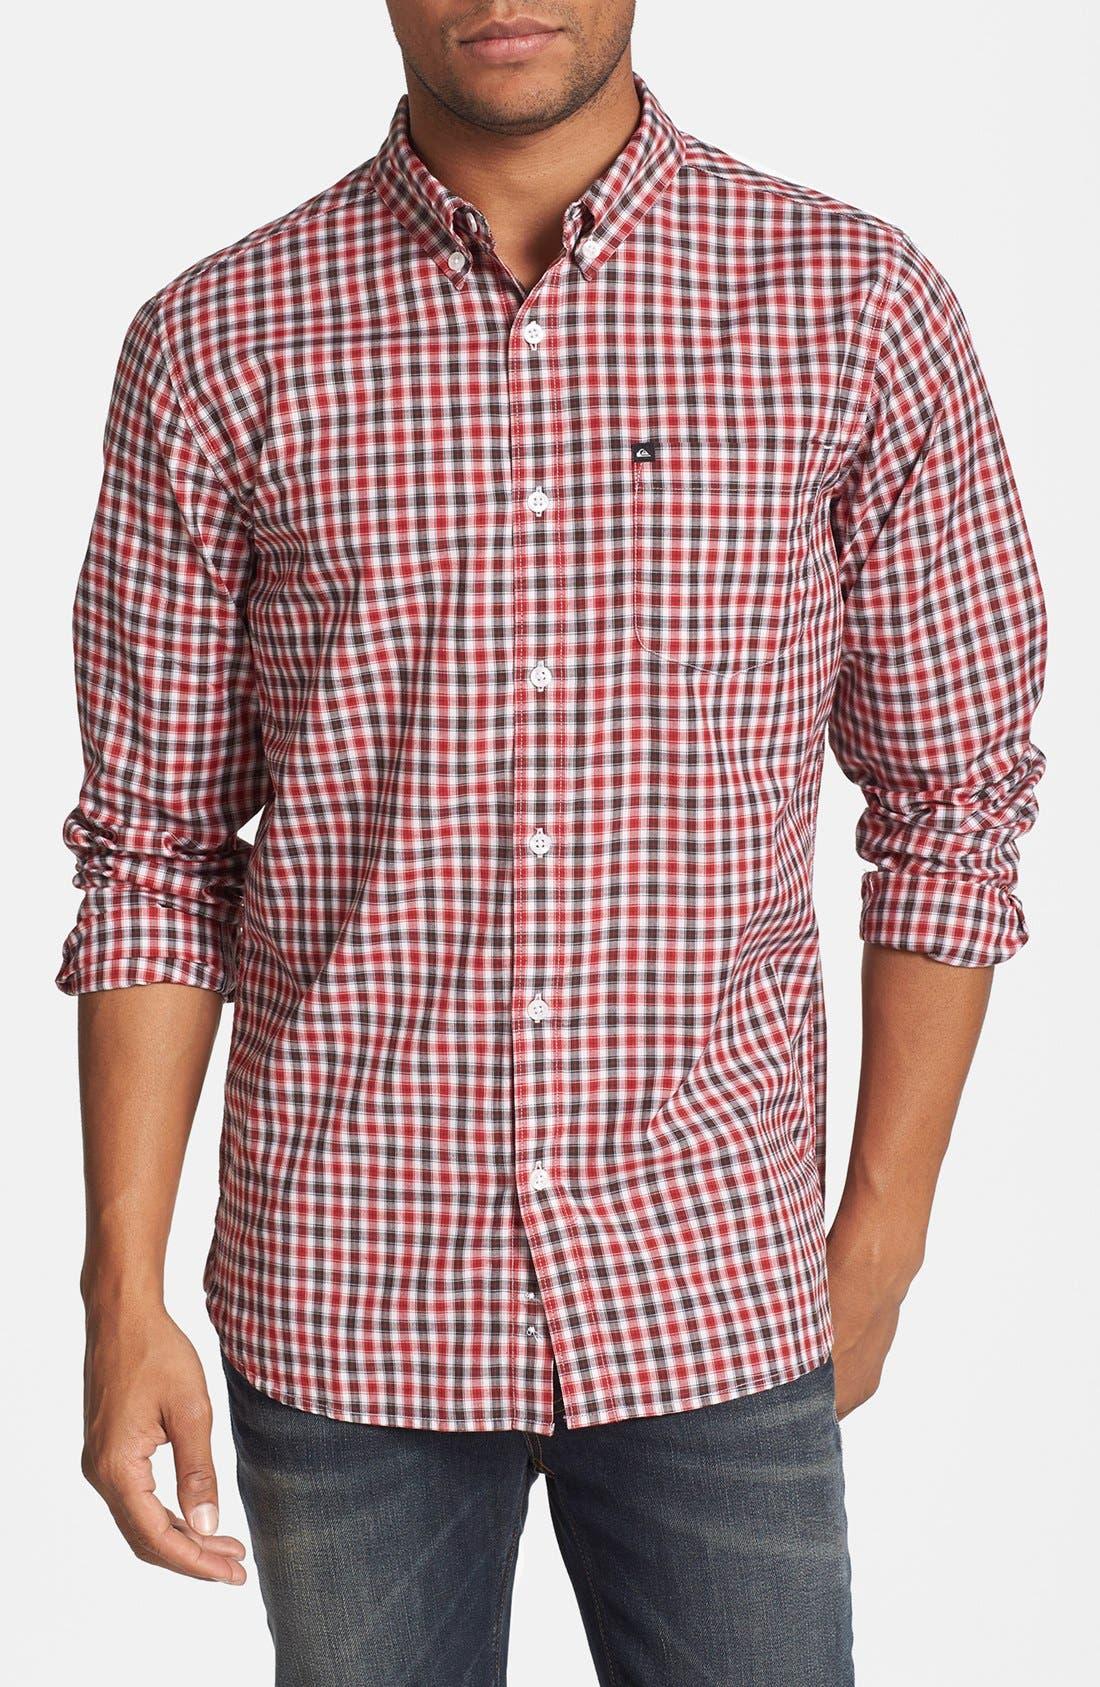 Main Image - Quiksilver Waterman 'Tight Lines' Check Shirt